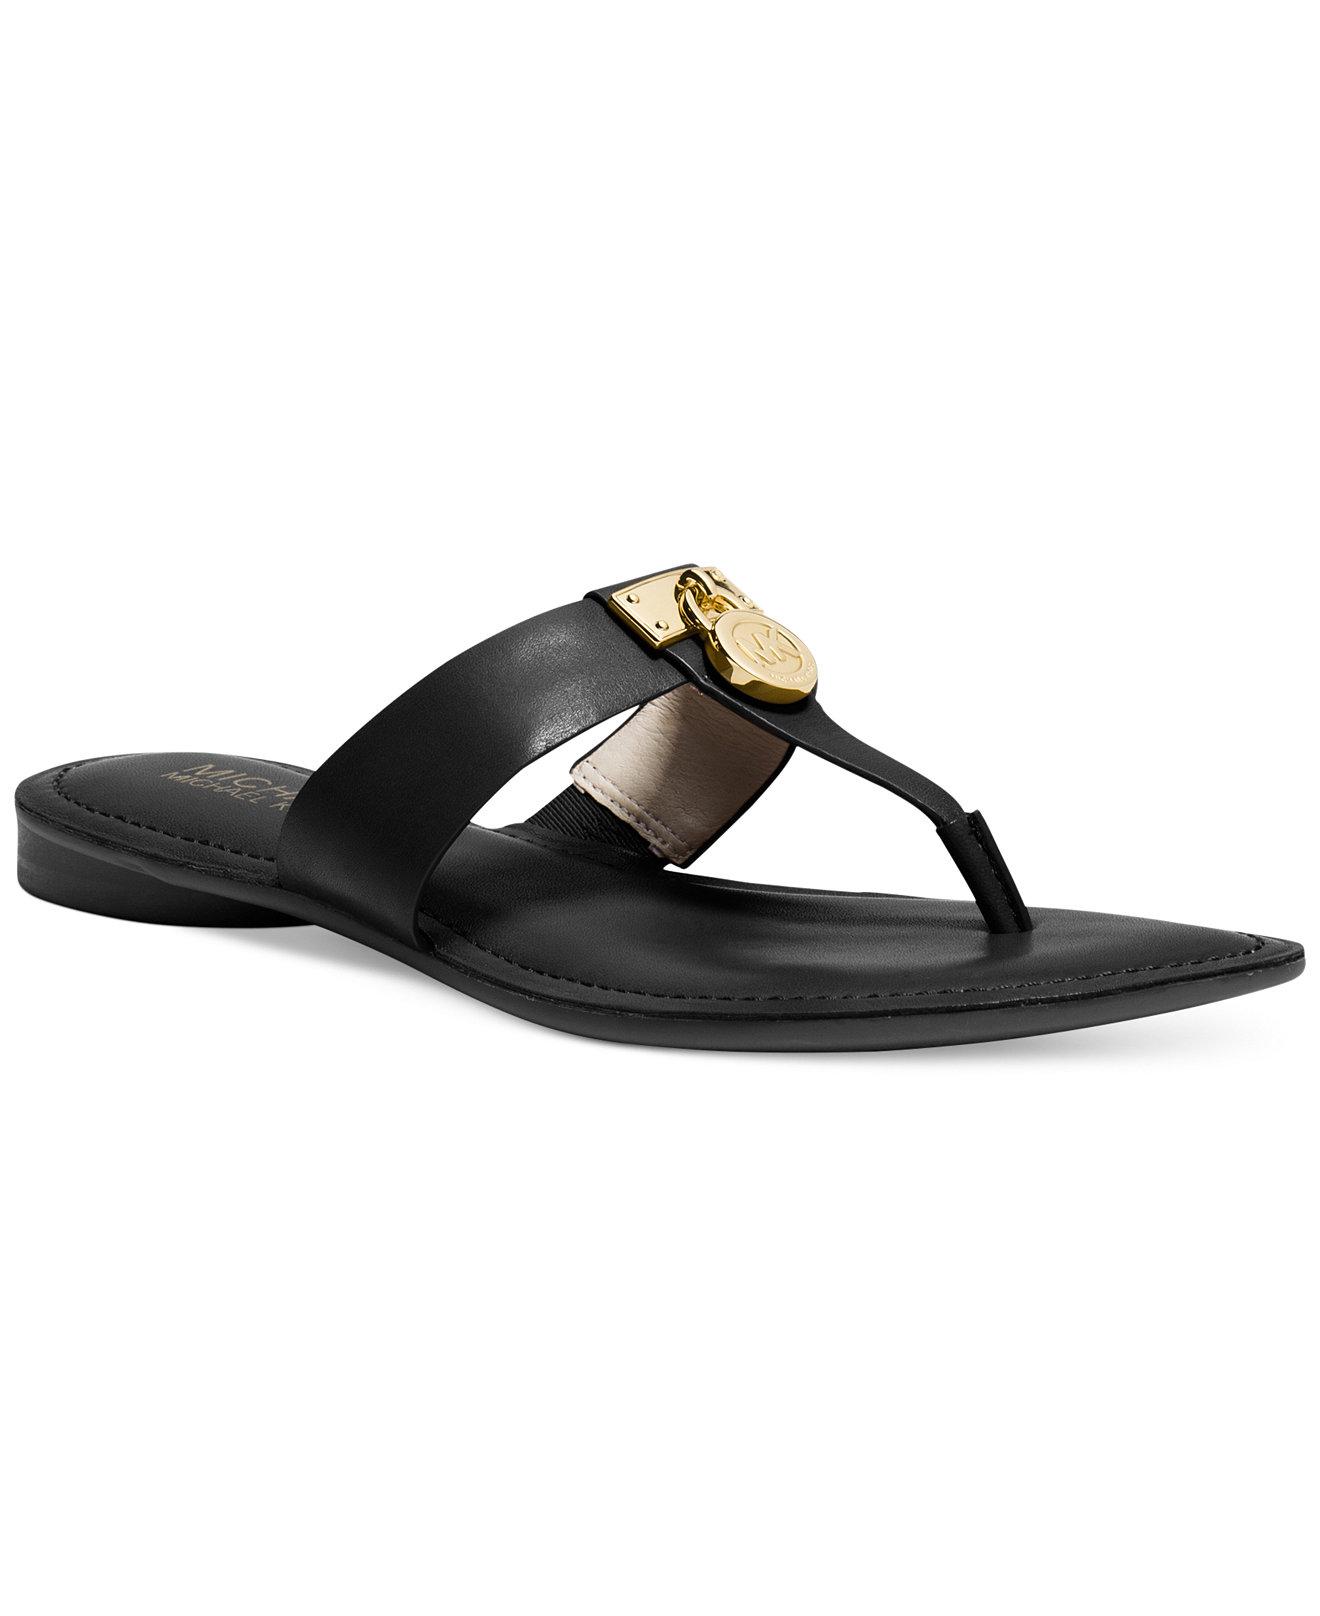 Michael Kors Shoes Michael Michael Kors Hamilton